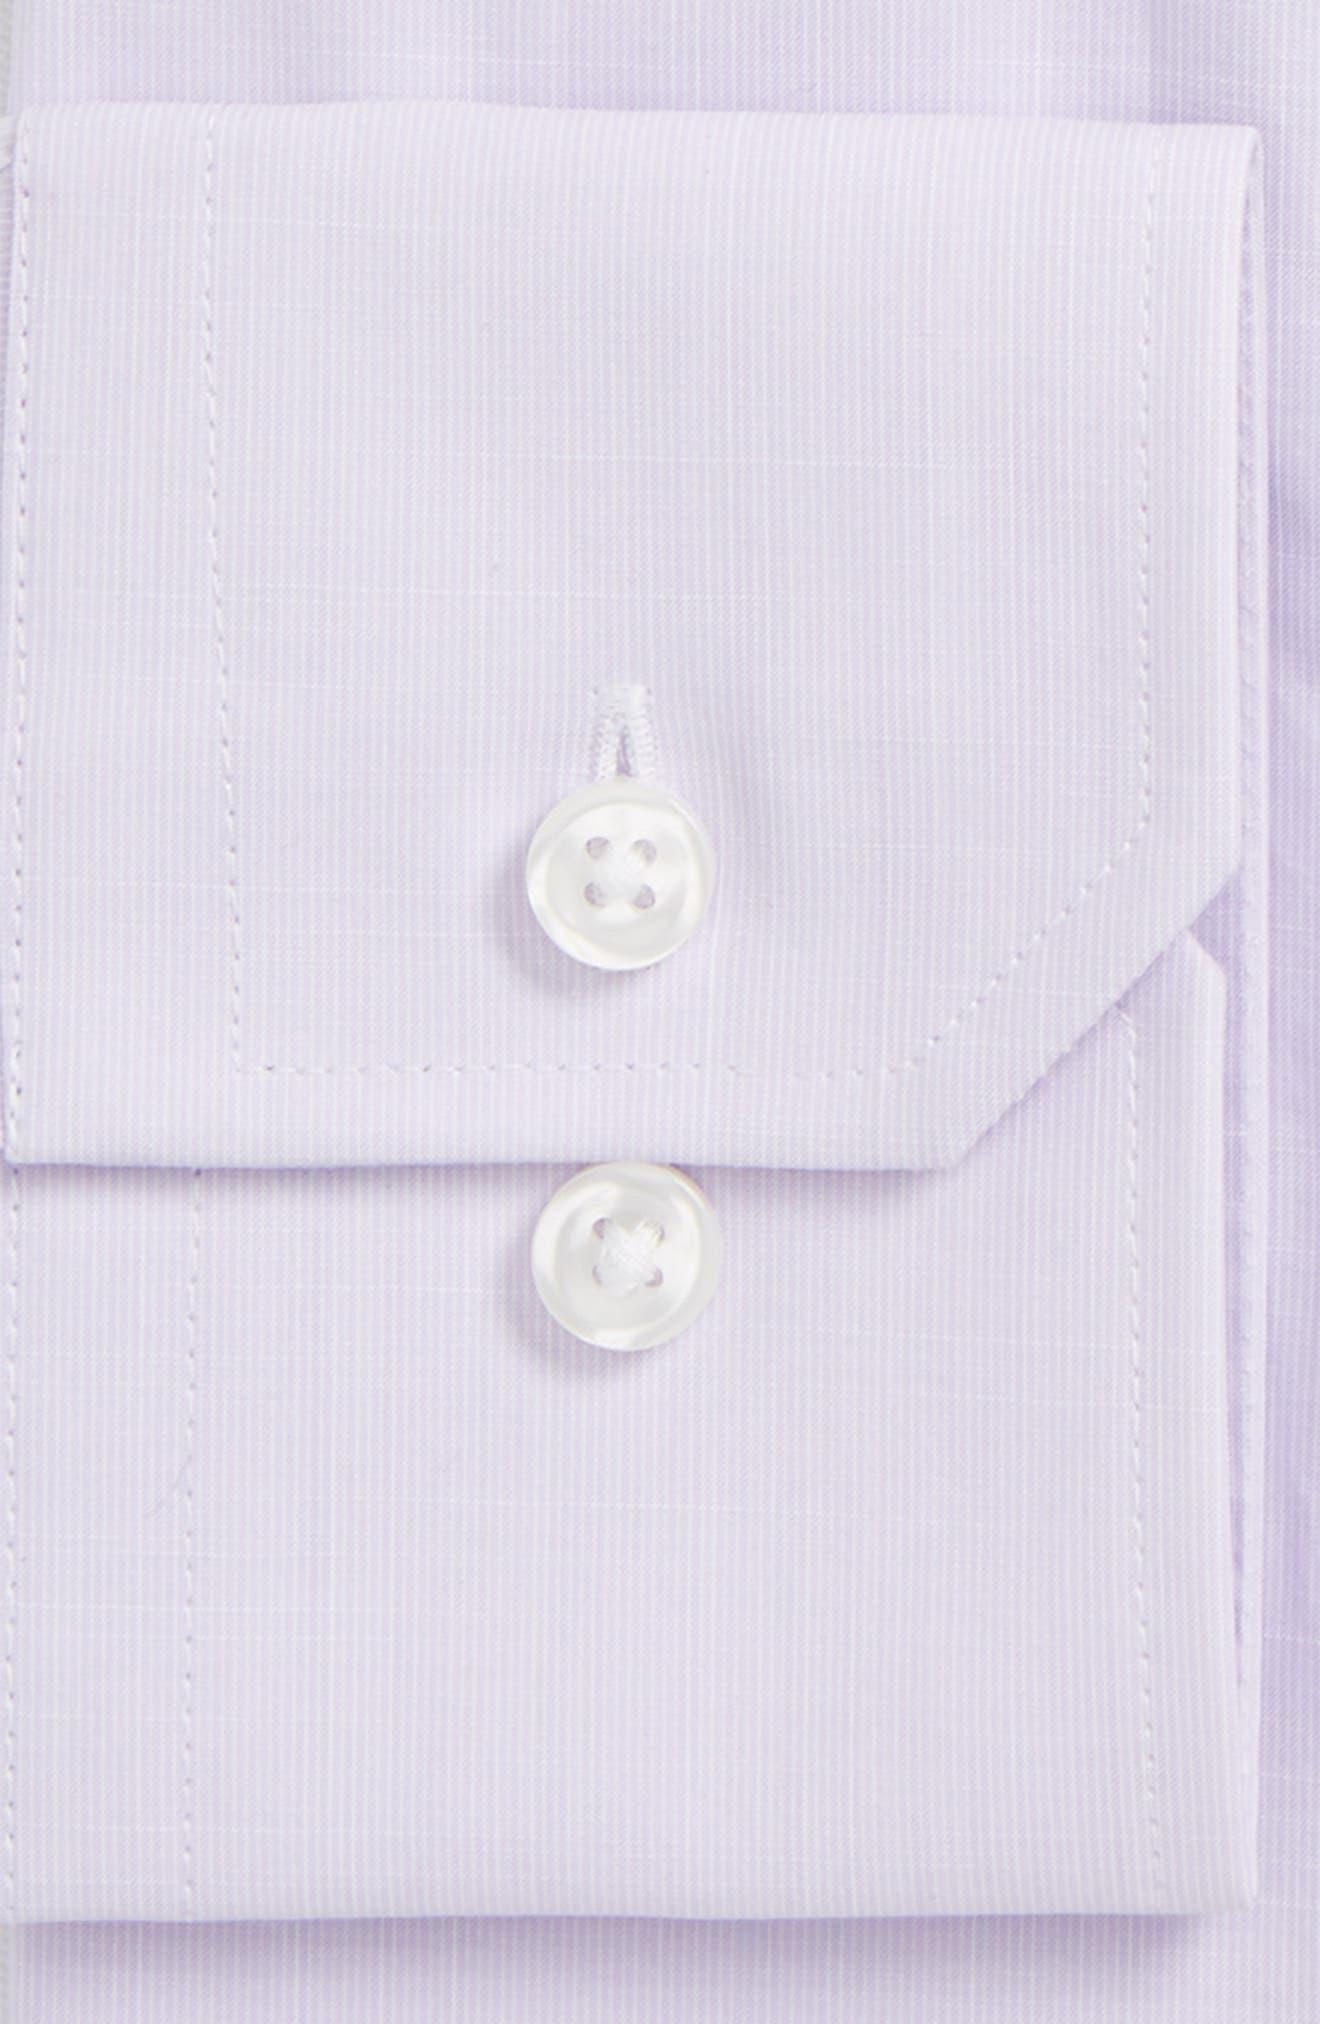 Espirit Trim Fit Solid Dress Shirt,                             Alternate thumbnail 2, color,                             Lavender Solid